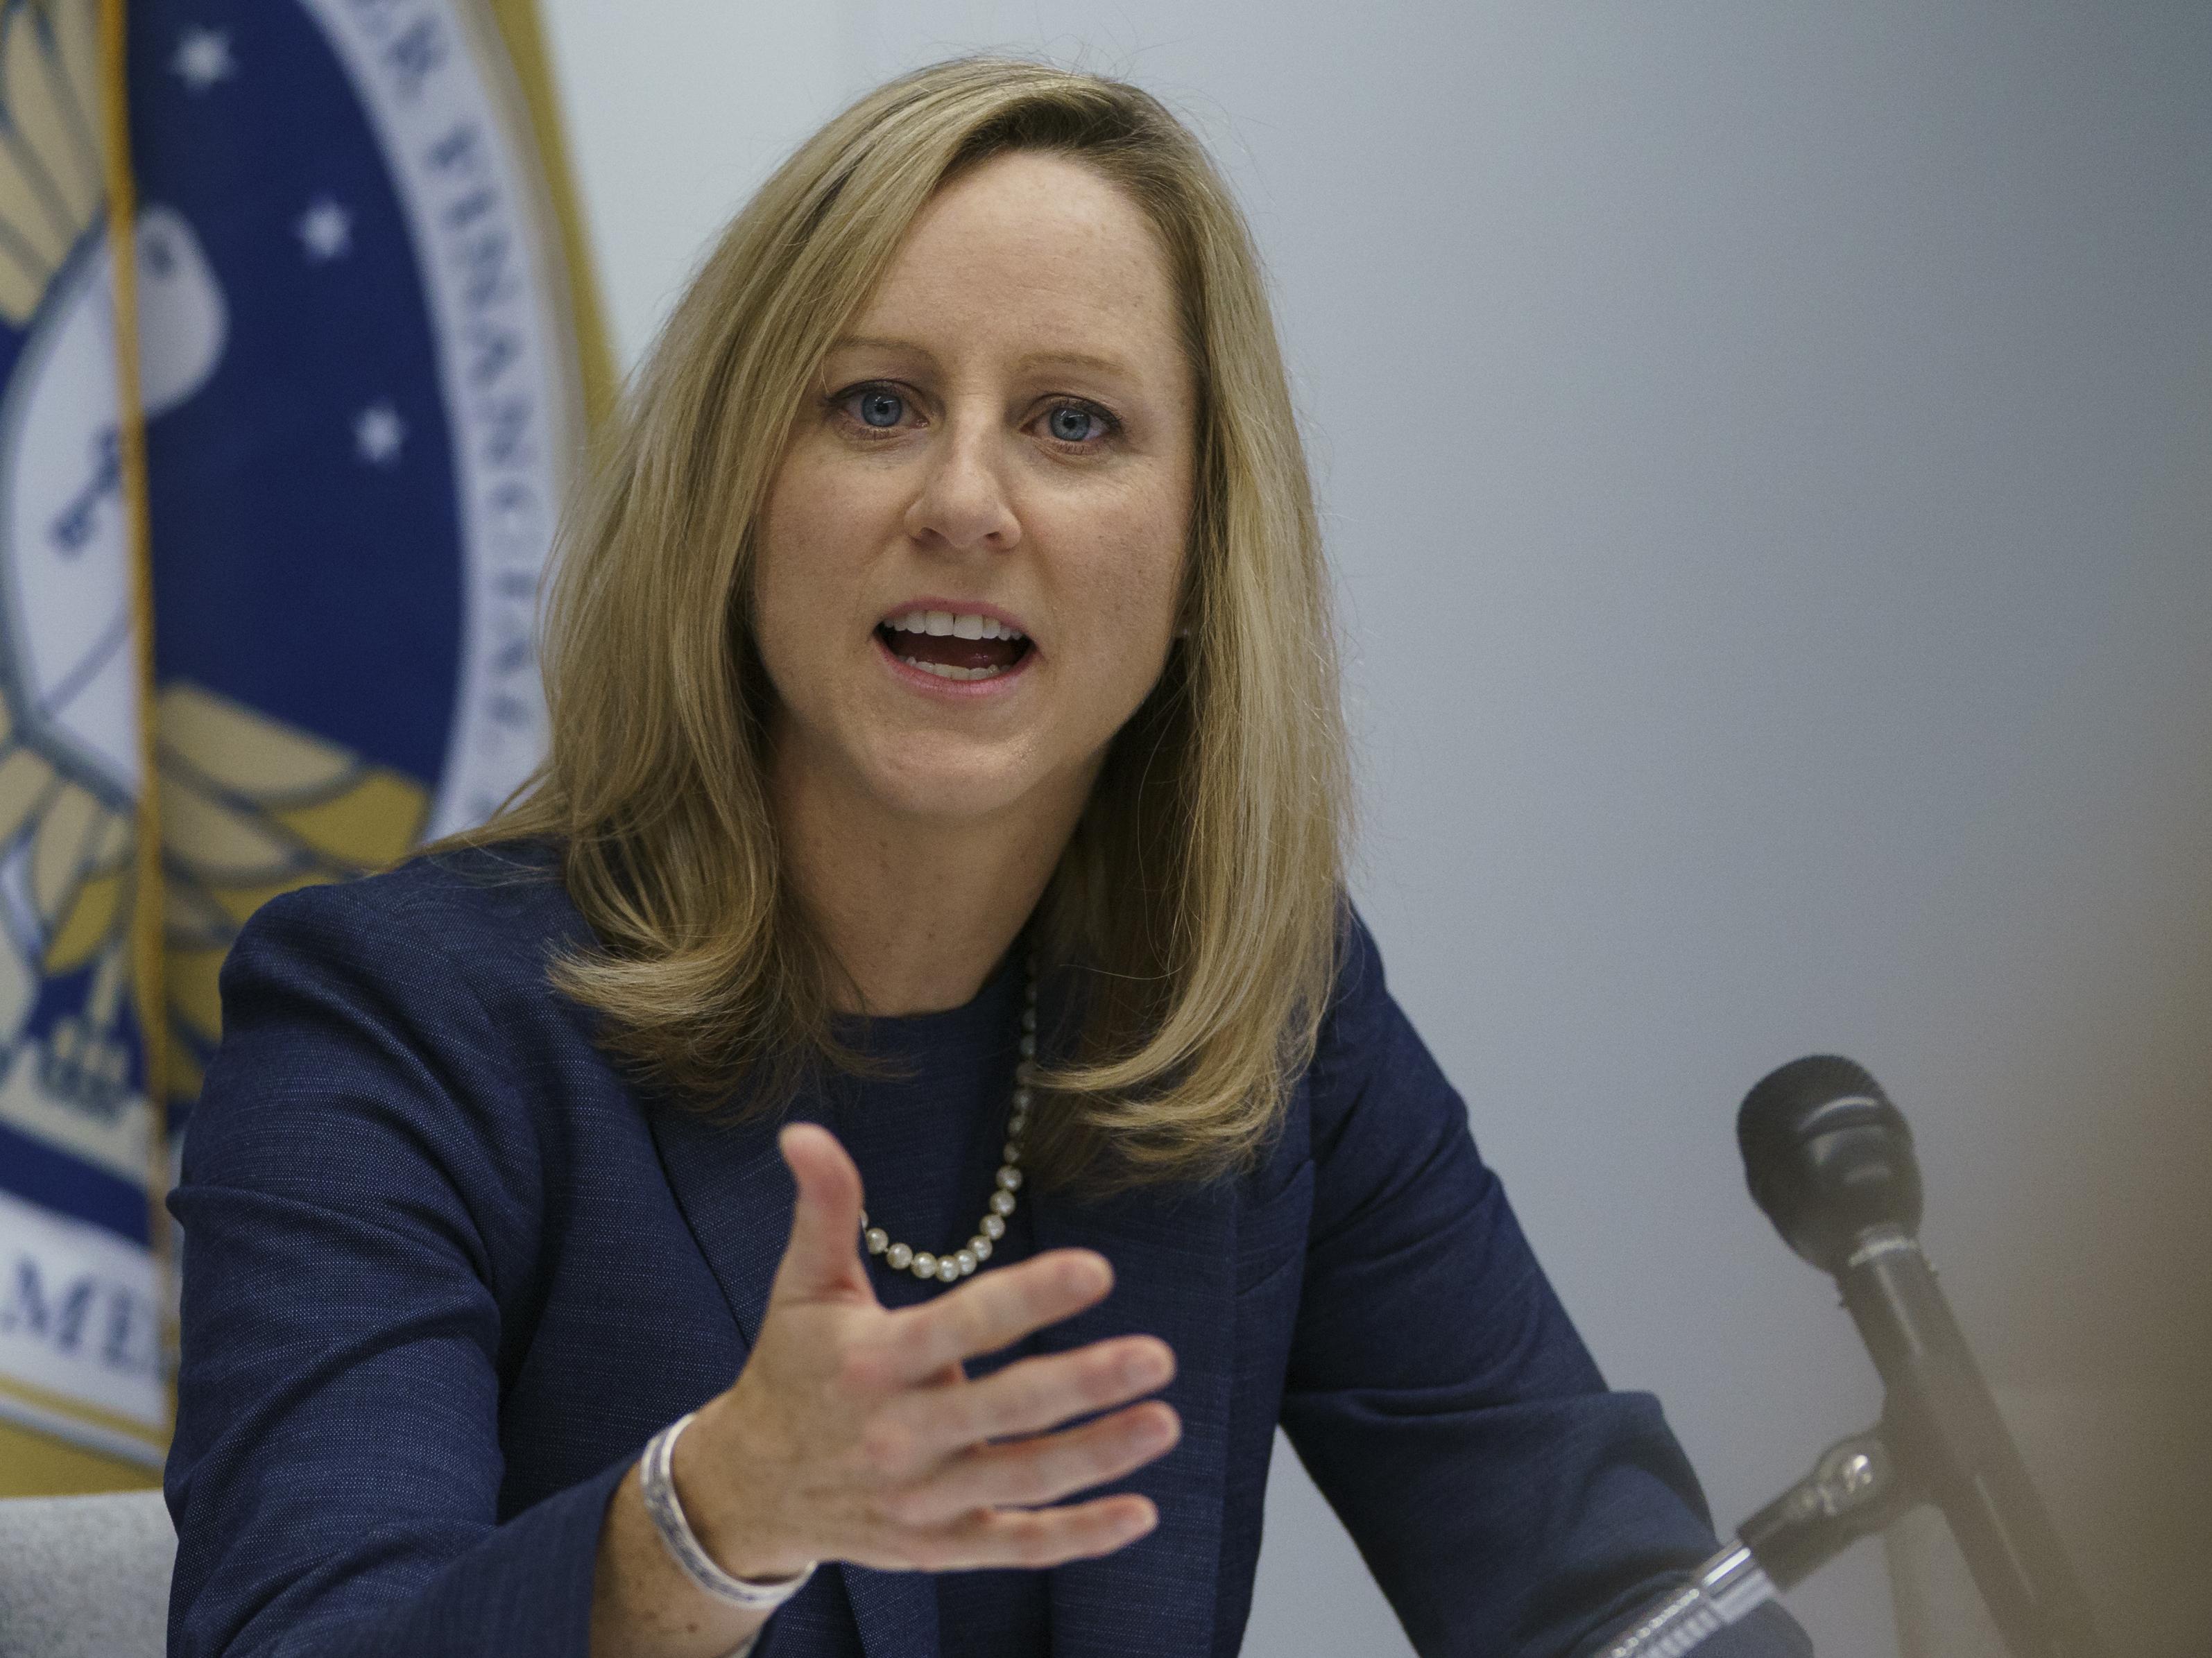 Consumer Financial Protection Bureau Director Kathy Kraninger speaks to media in Washington, D.C., in December 2018.